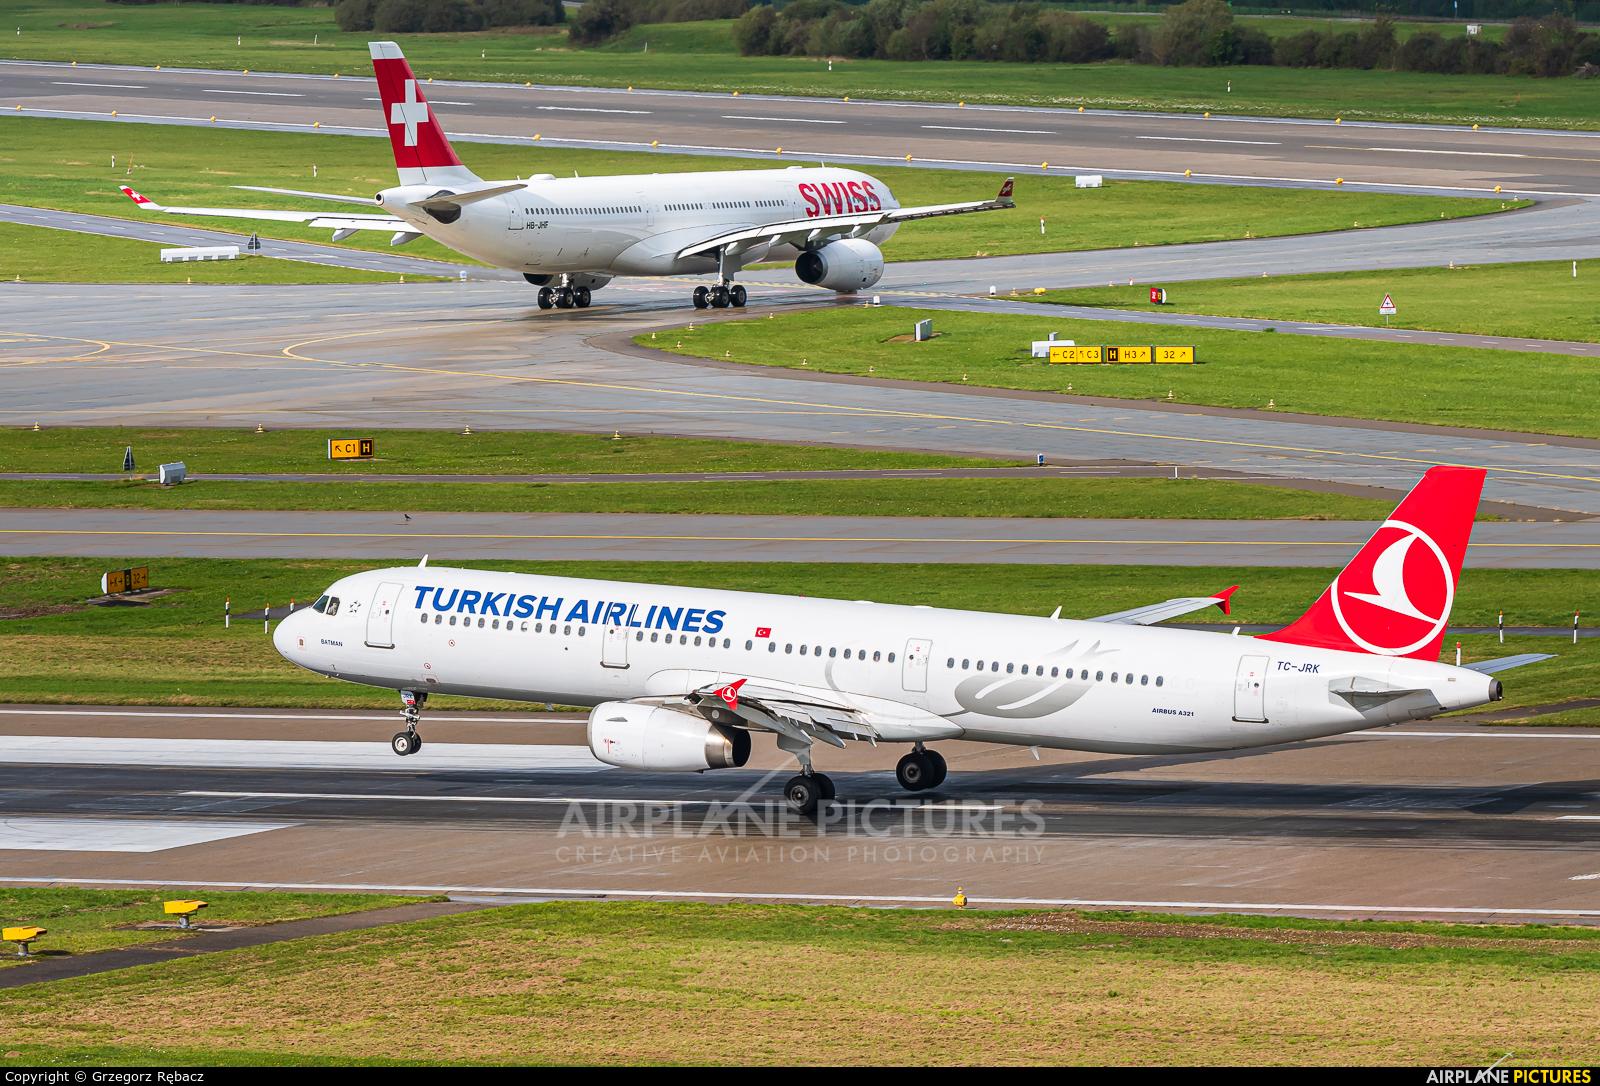 Turkish Airlines TC-JRK aircraft at Zurich